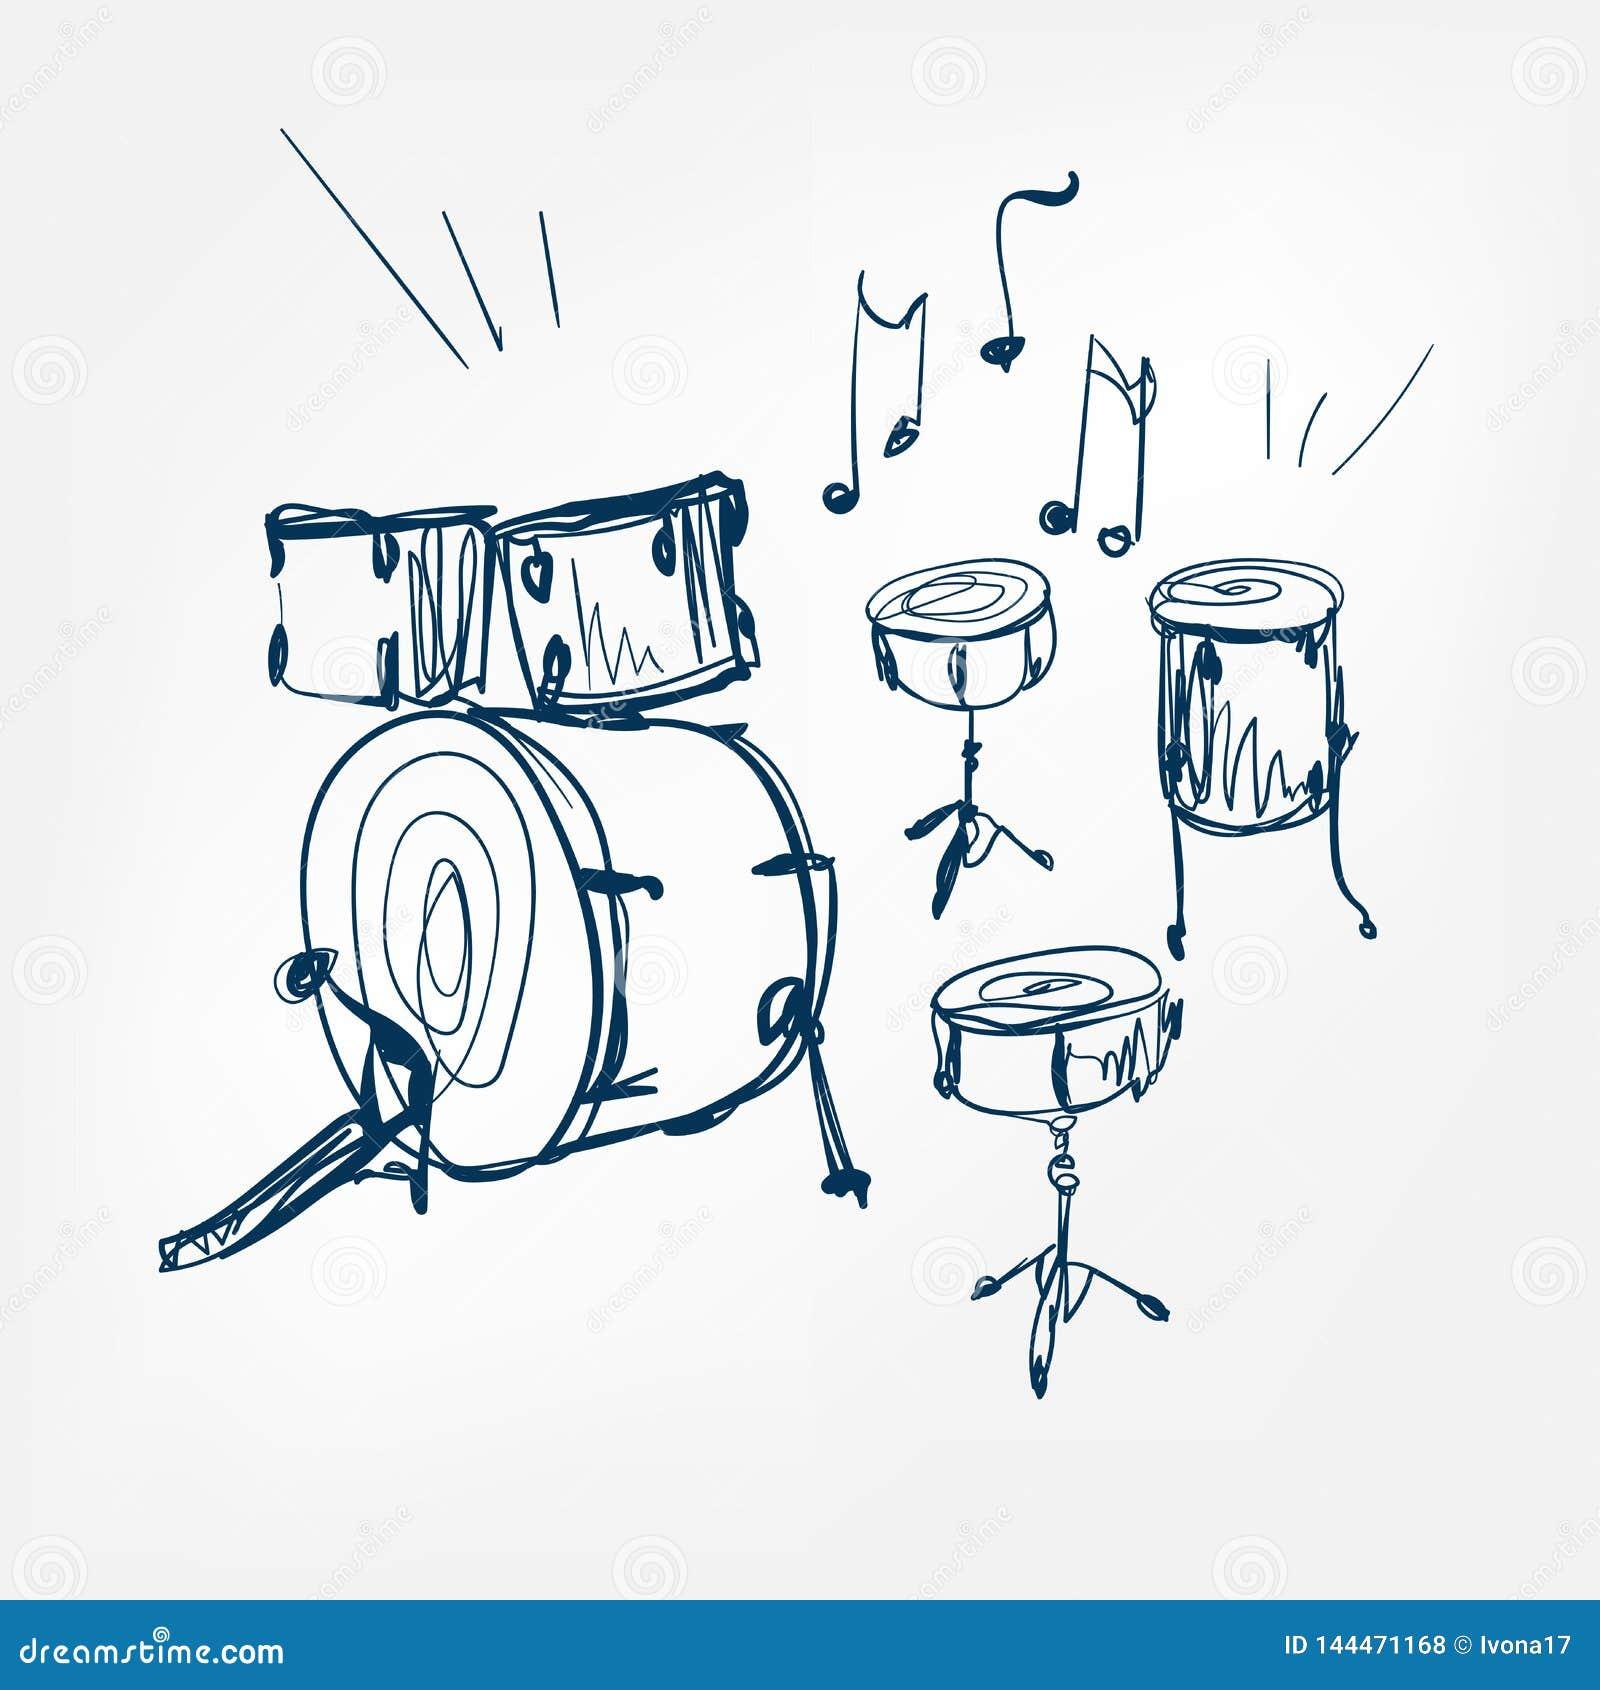 Drum set sketch vector illustration isolated design element